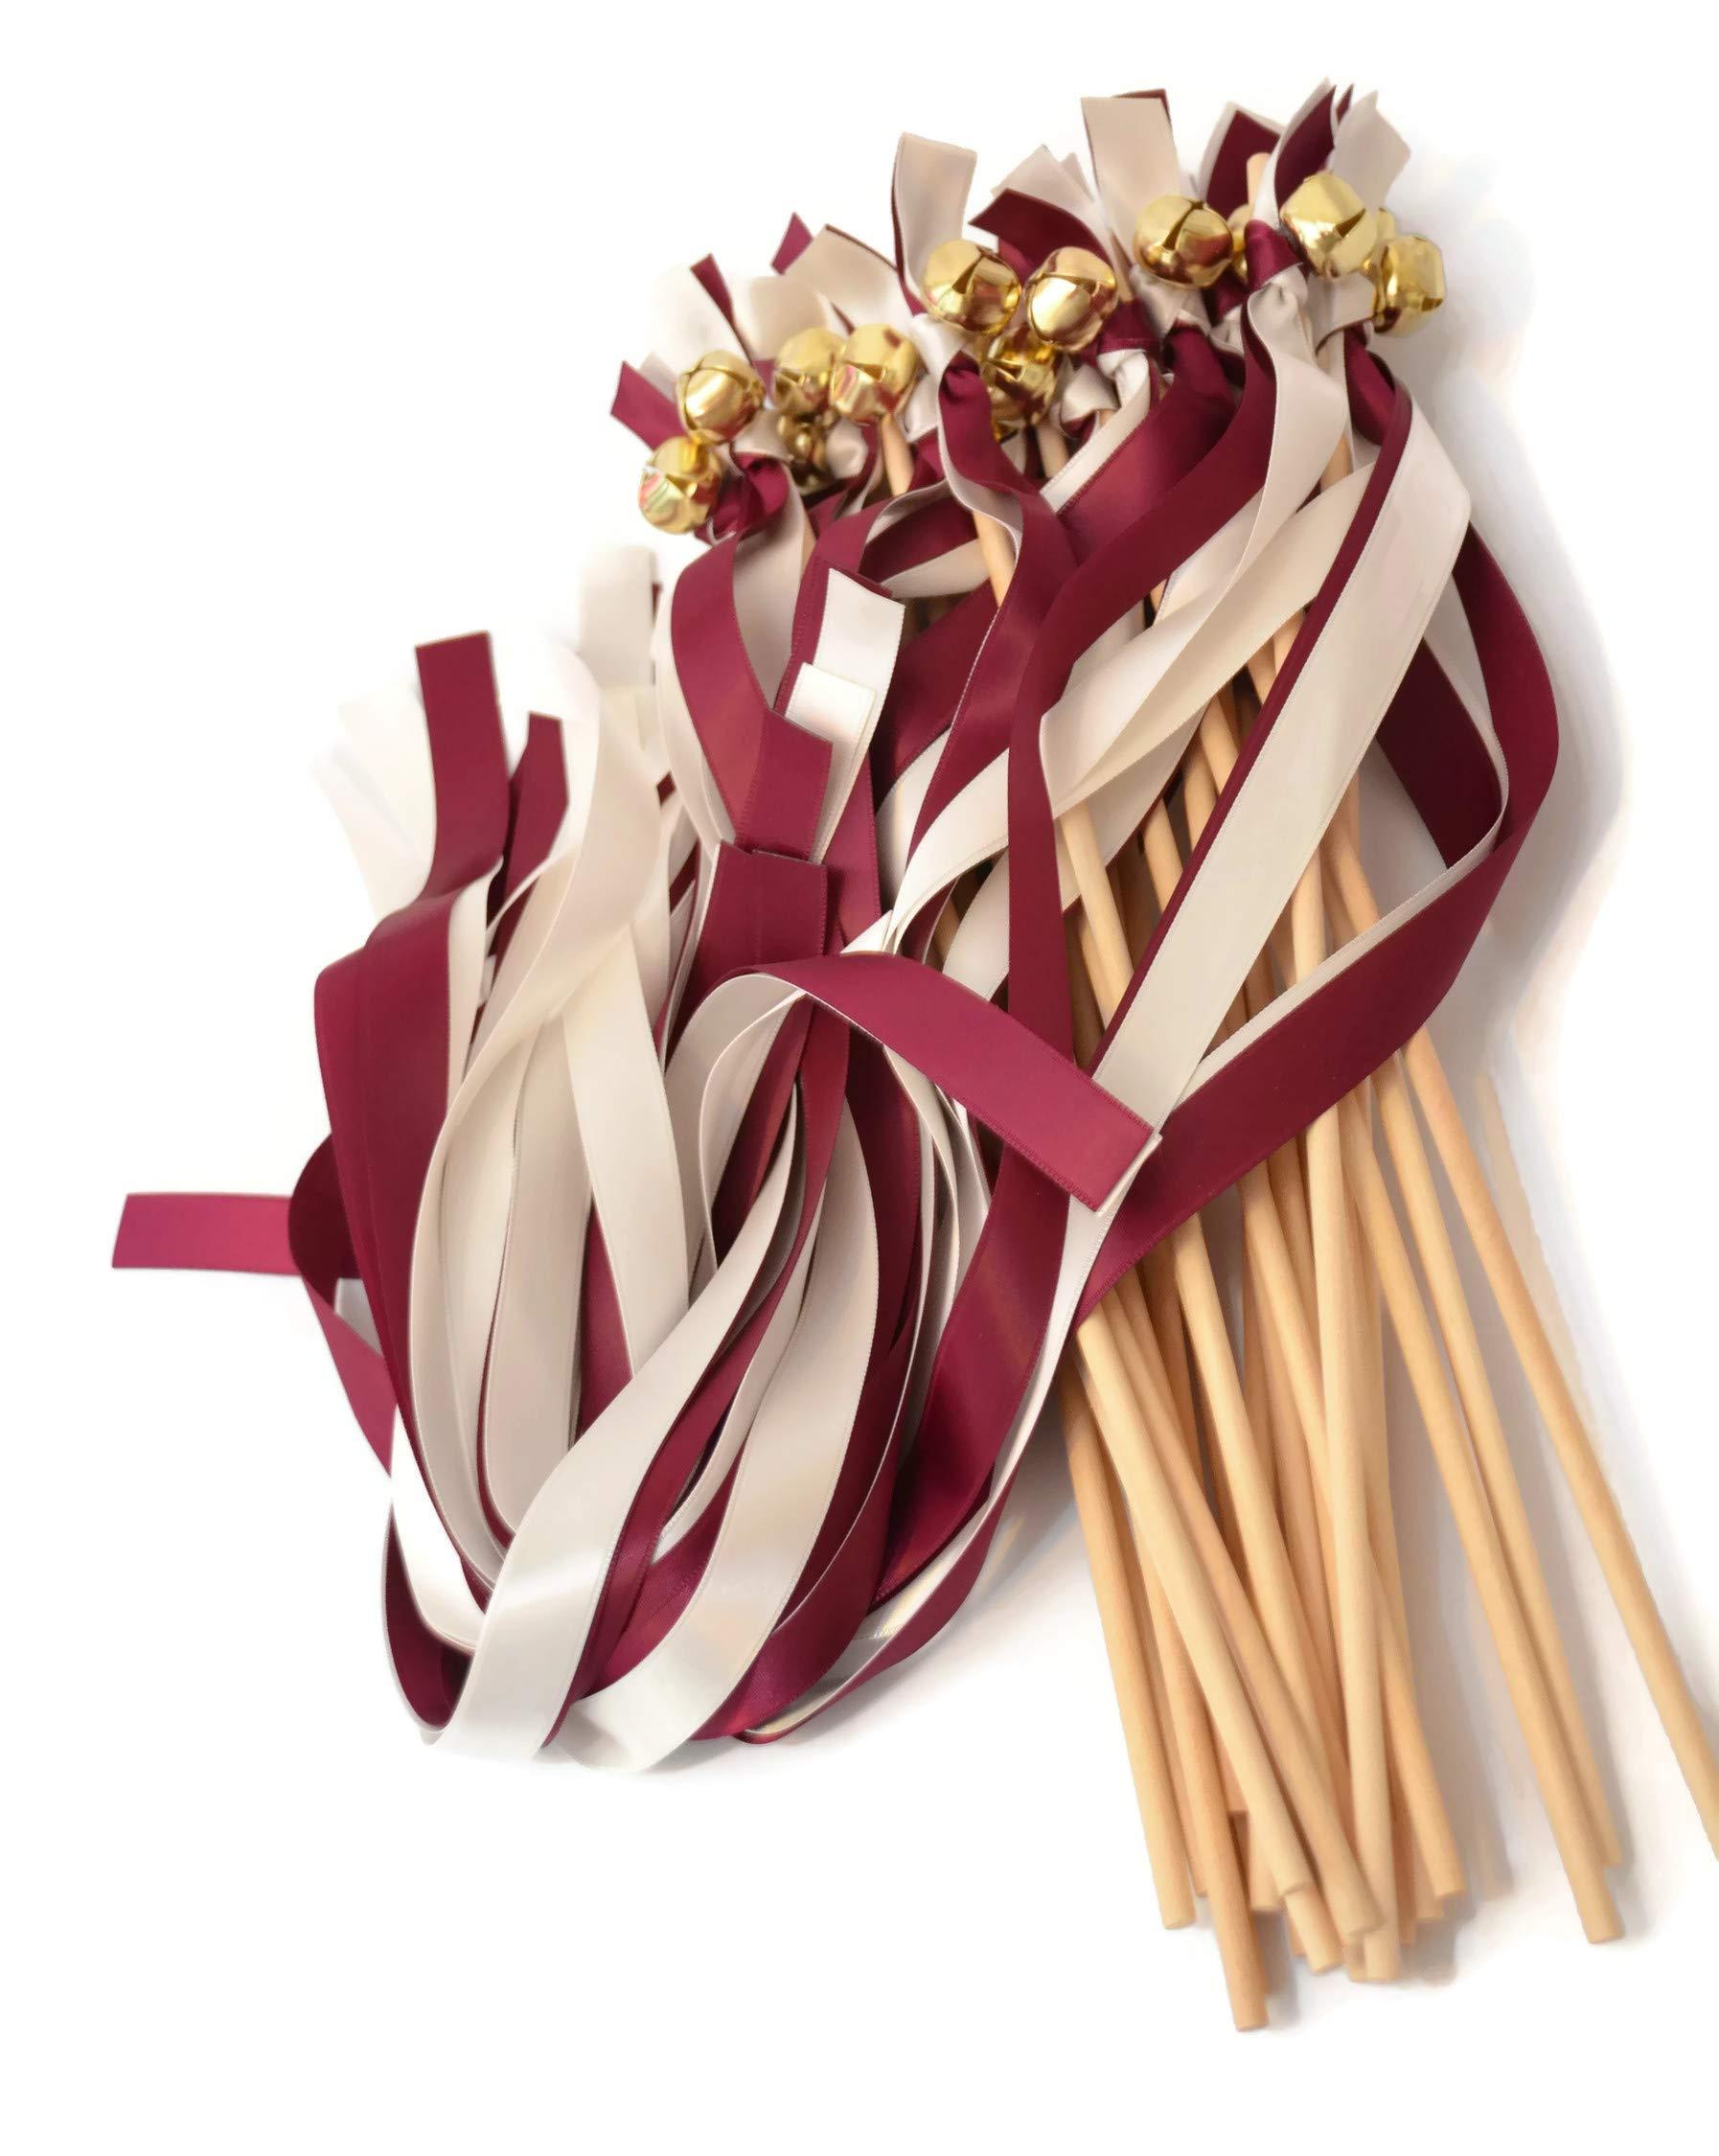 25 Burgundy & Ivory Ribbon Gold Bell Wedding Wands #DivinityBraid #SendOffBells #WeddingWands #Wedding #Favors #CeremonySendOff #Party #KissingBells #RibbonWands by Divinity Braid by ASV Weddings